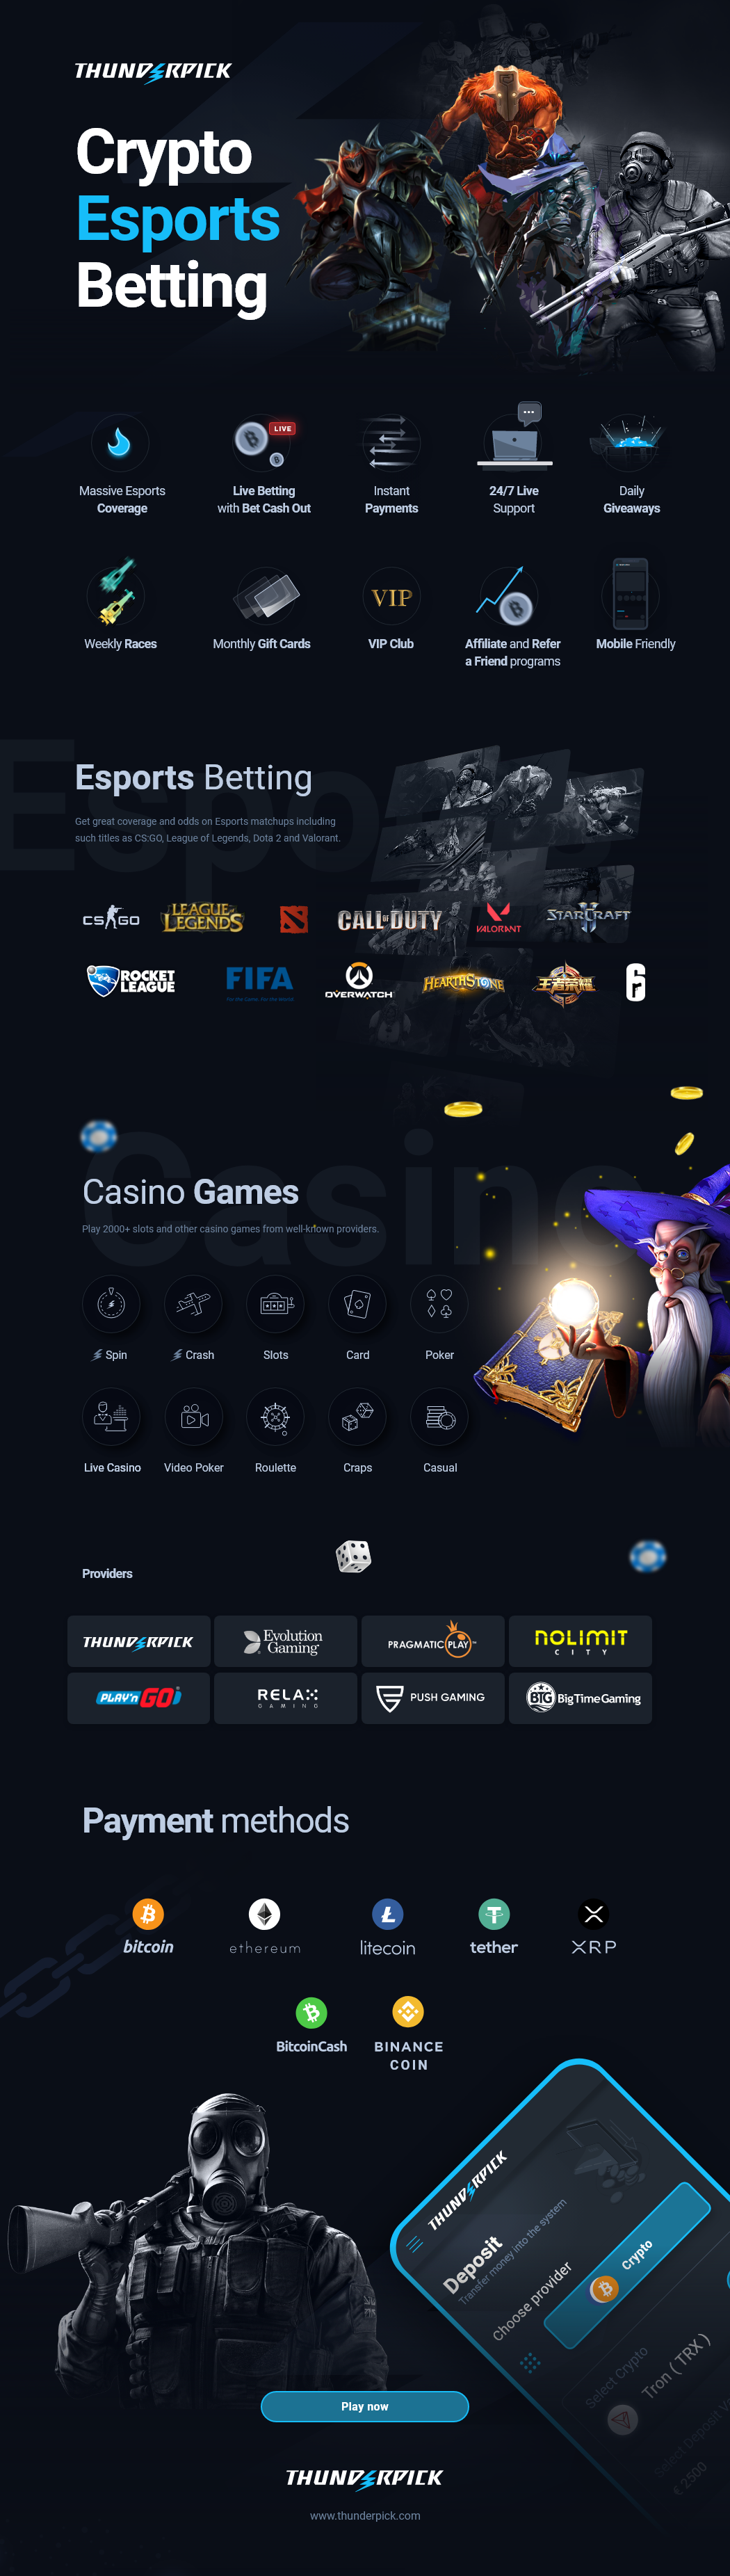 Thunderpick-crypto-esports-betting.png